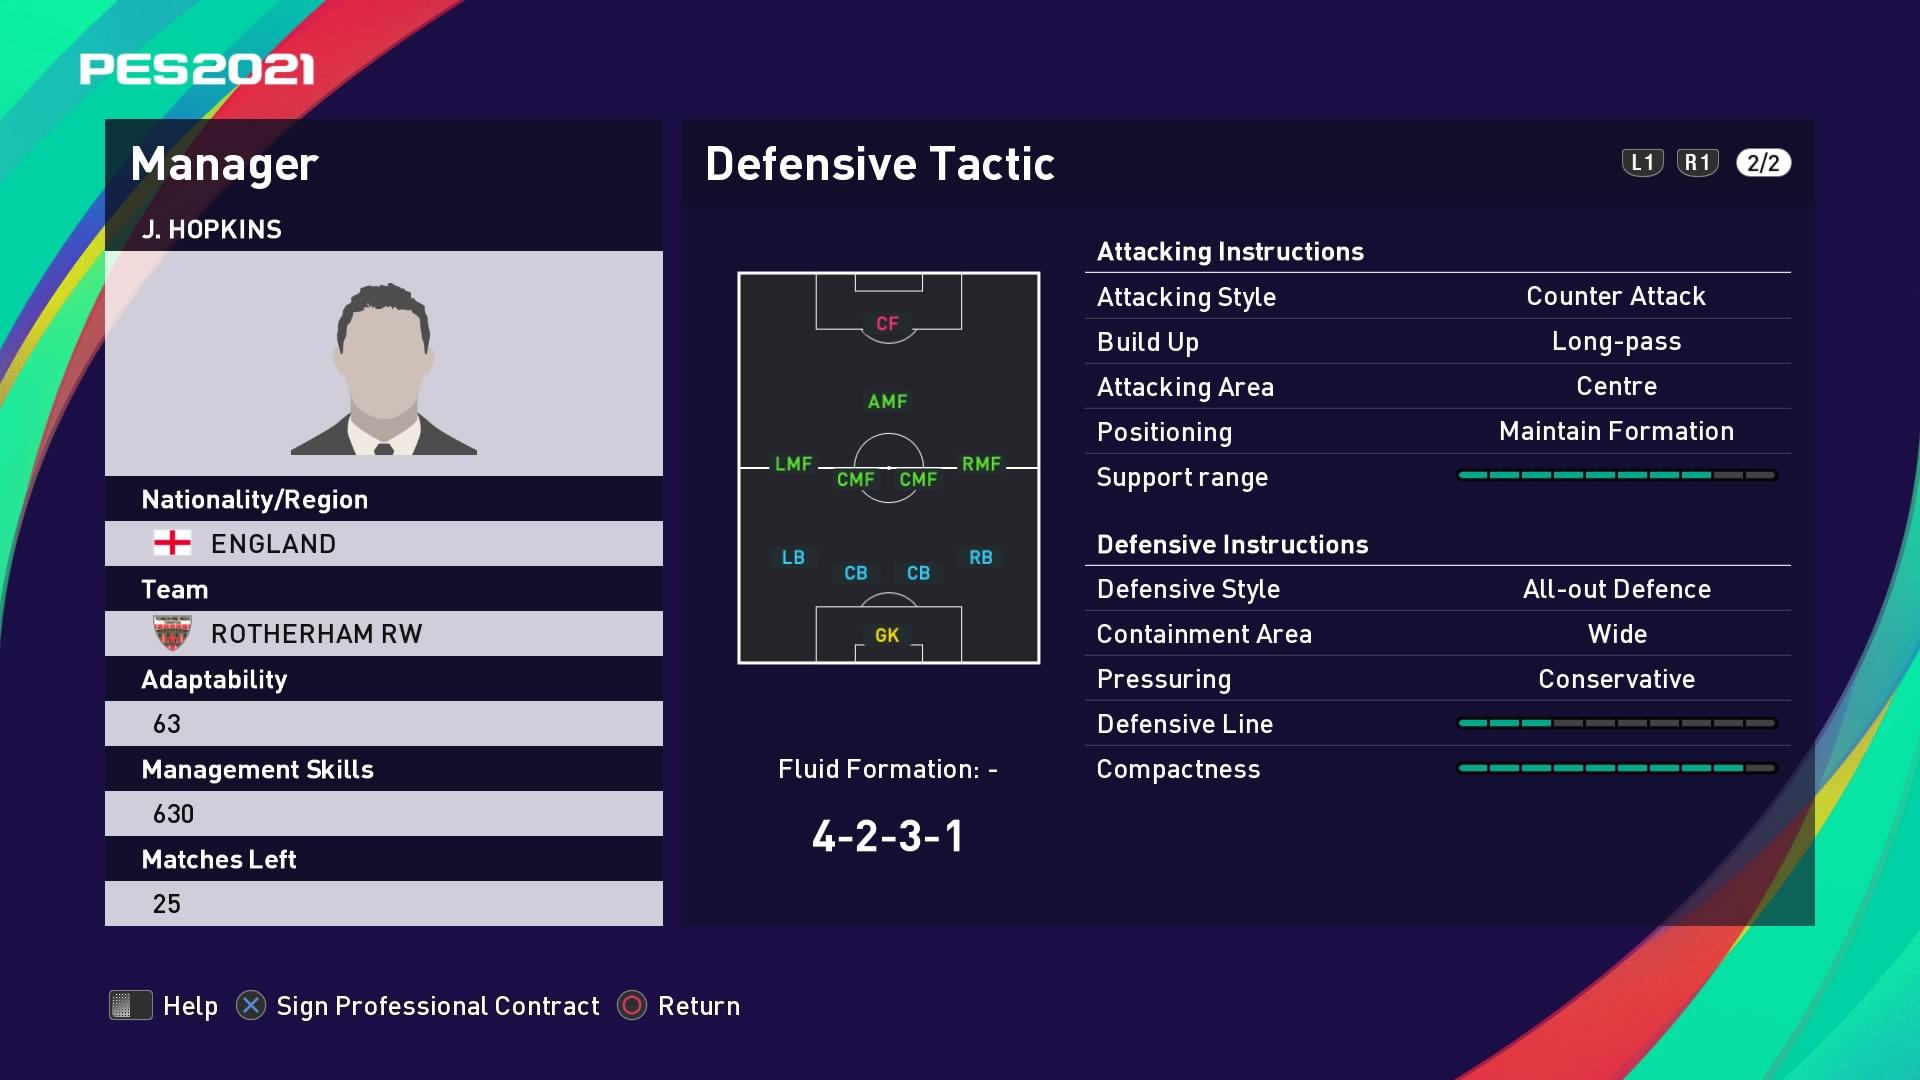 J. Hopkins (Paul Warne) Defensive Tactic in PES 2021 myClub